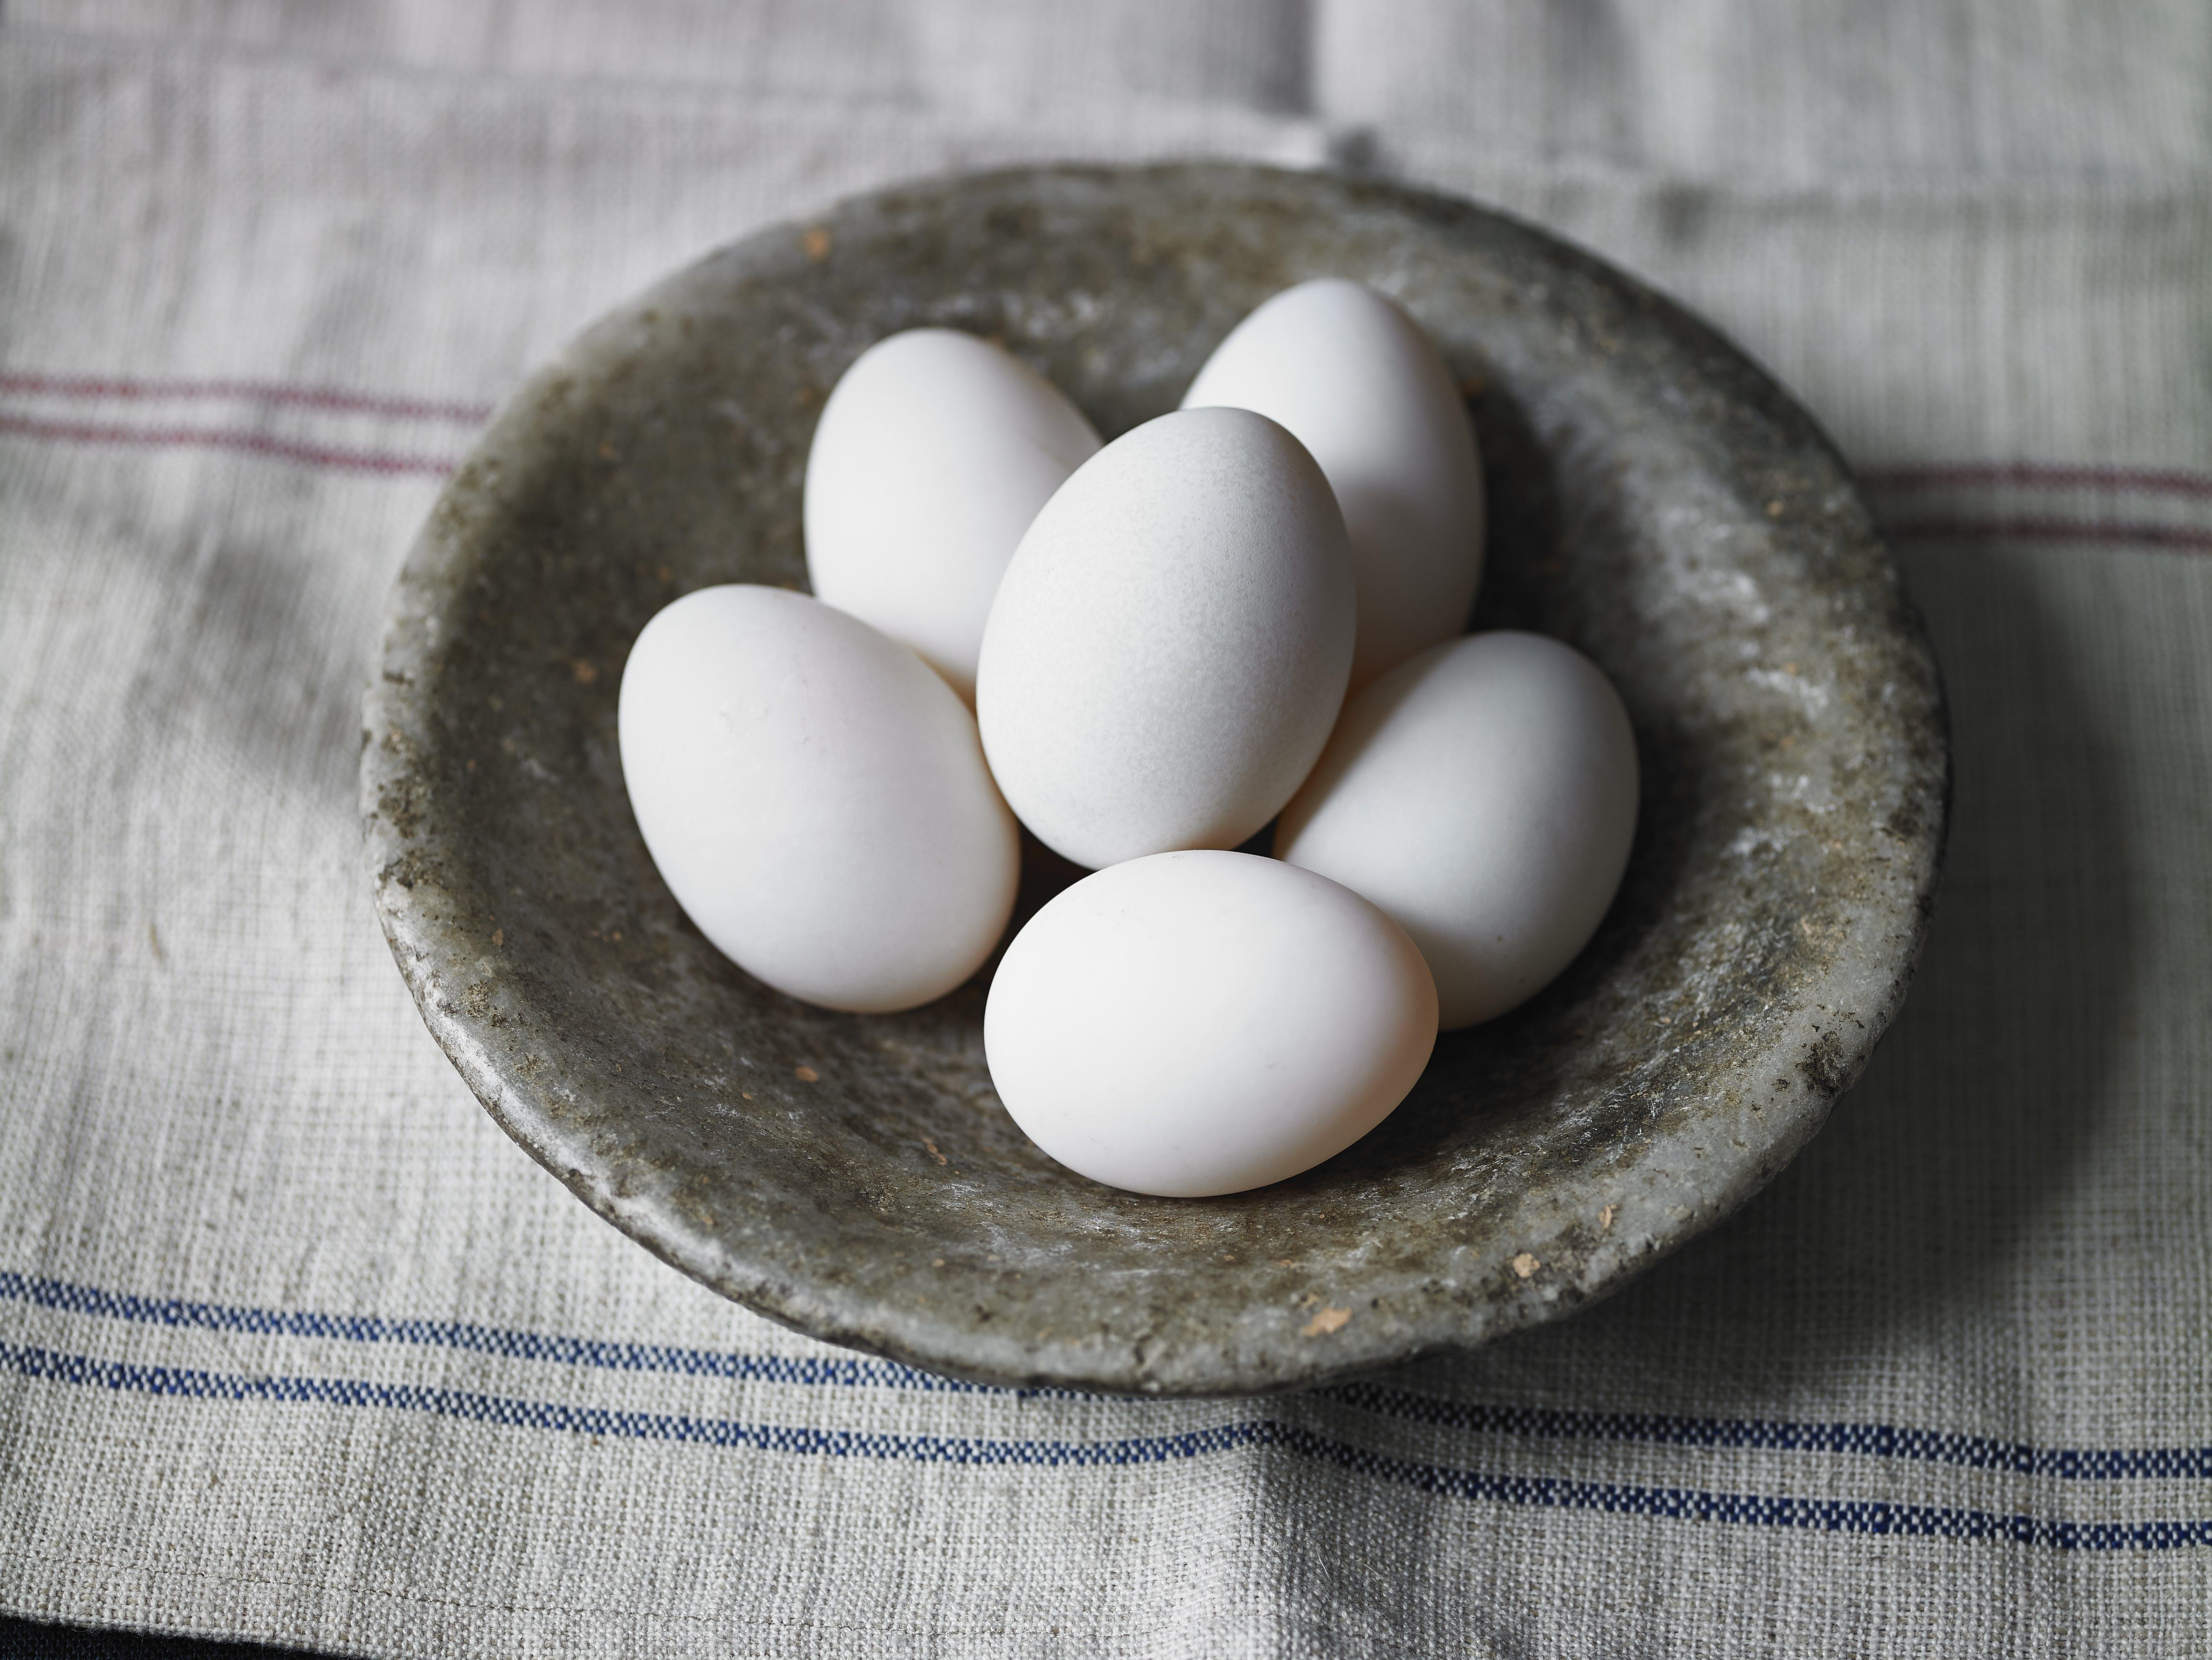 Free Range Duck Eggs